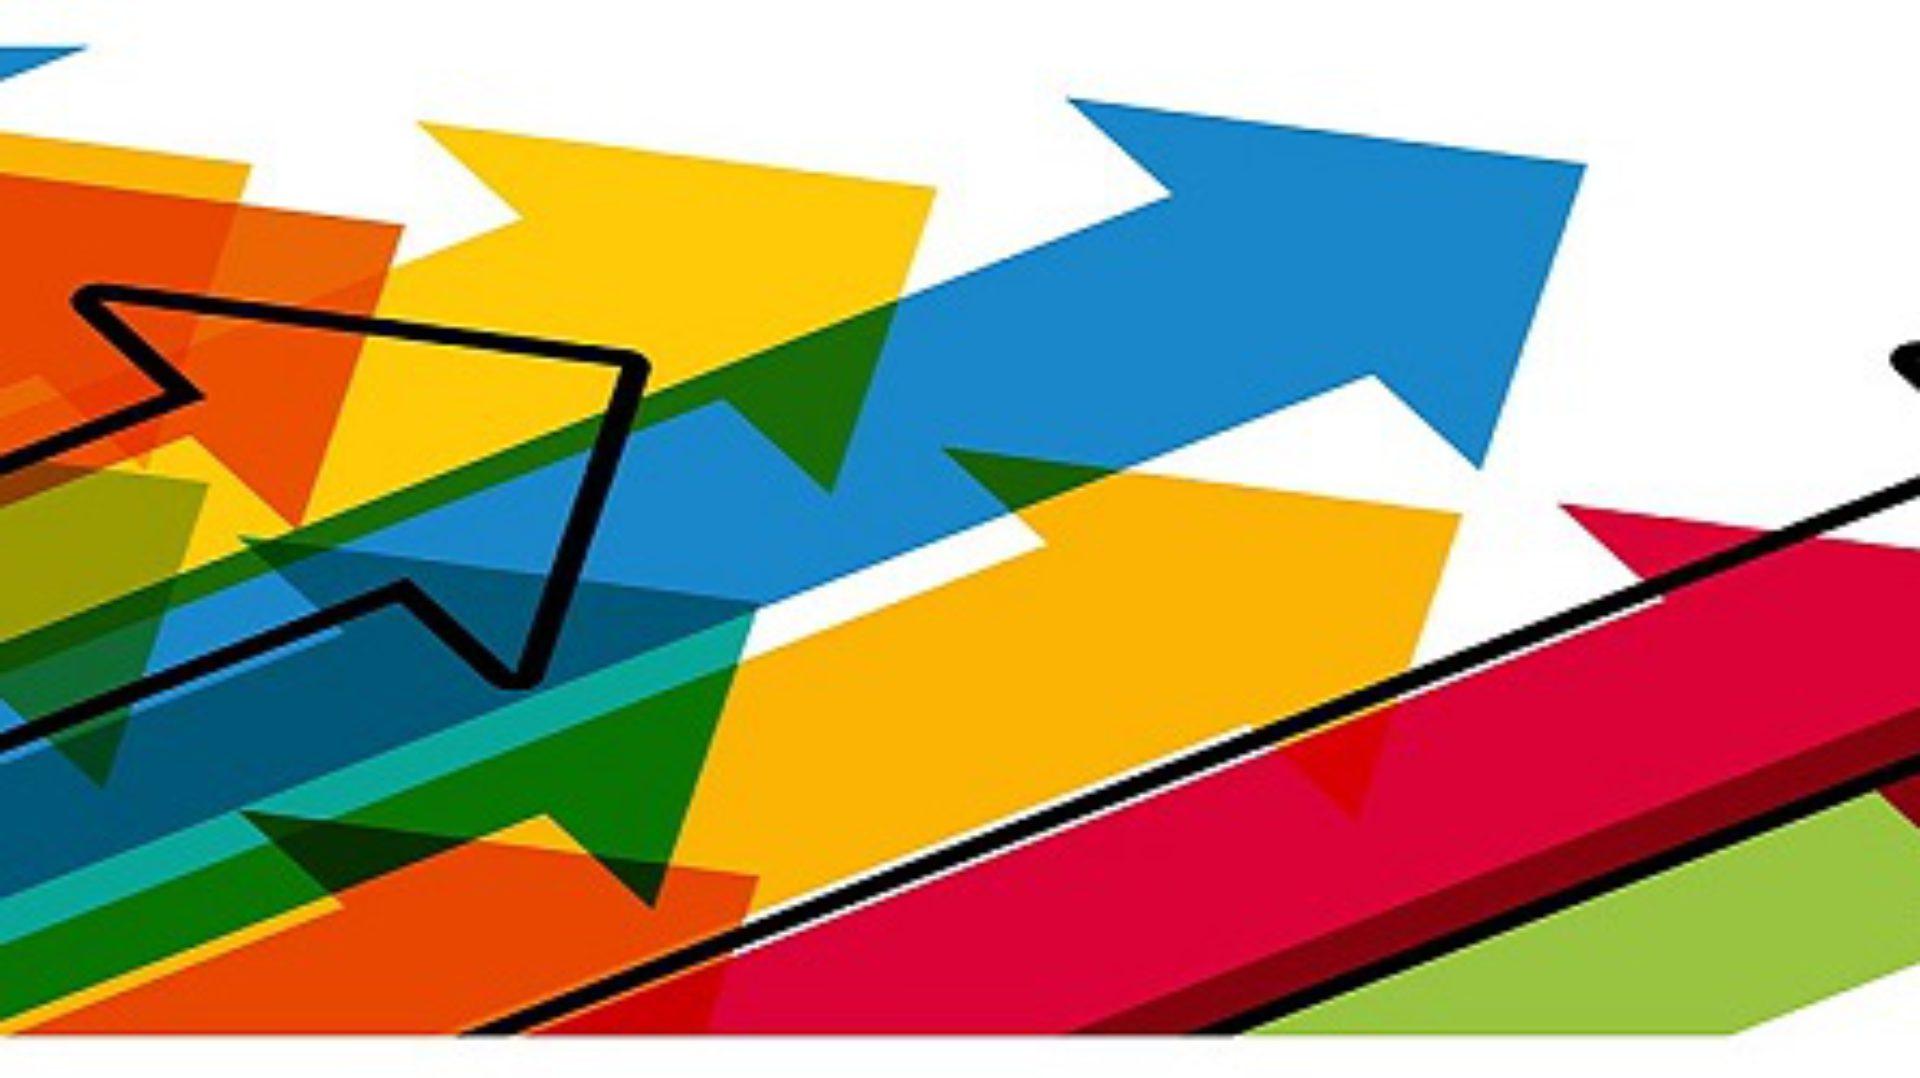 Online Επιχειρήσεις κατασκευή ιστοσελίδων